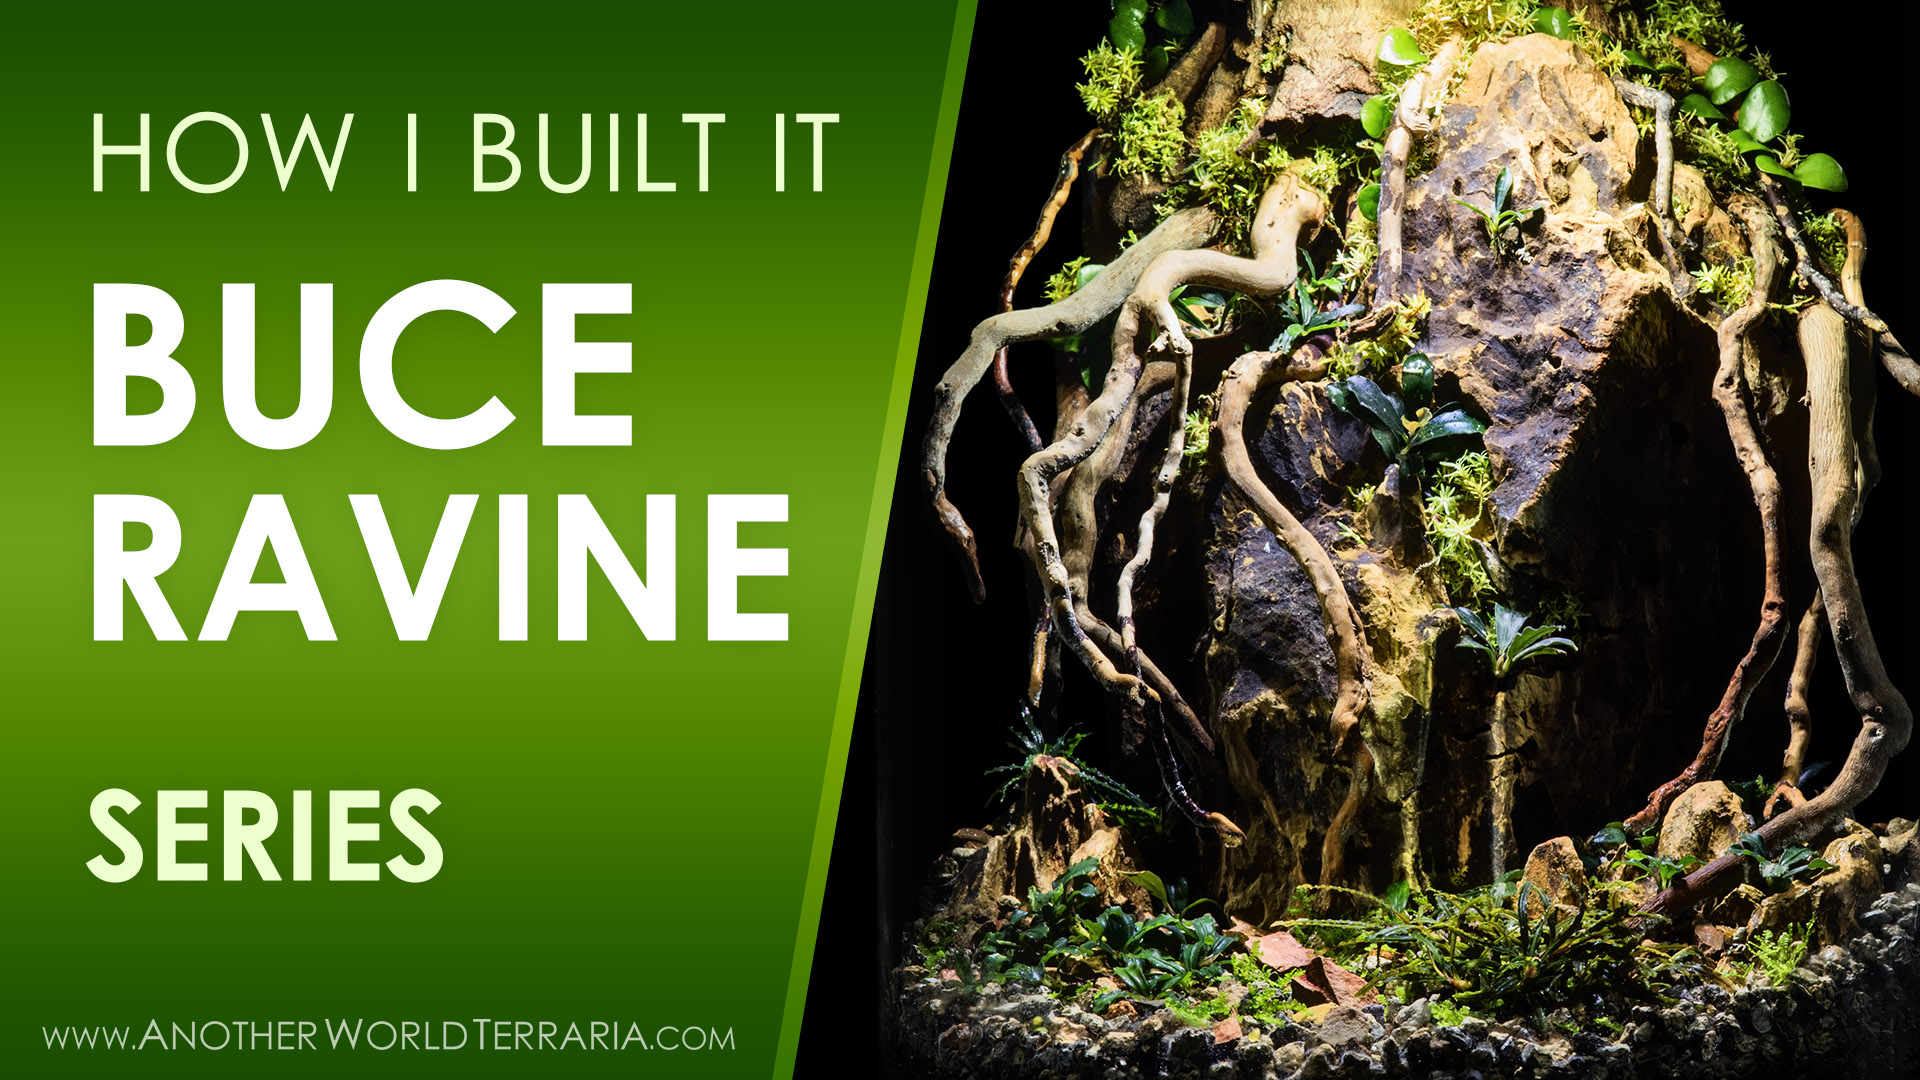 How I Built the Buce Ravine Terrarium Video Series